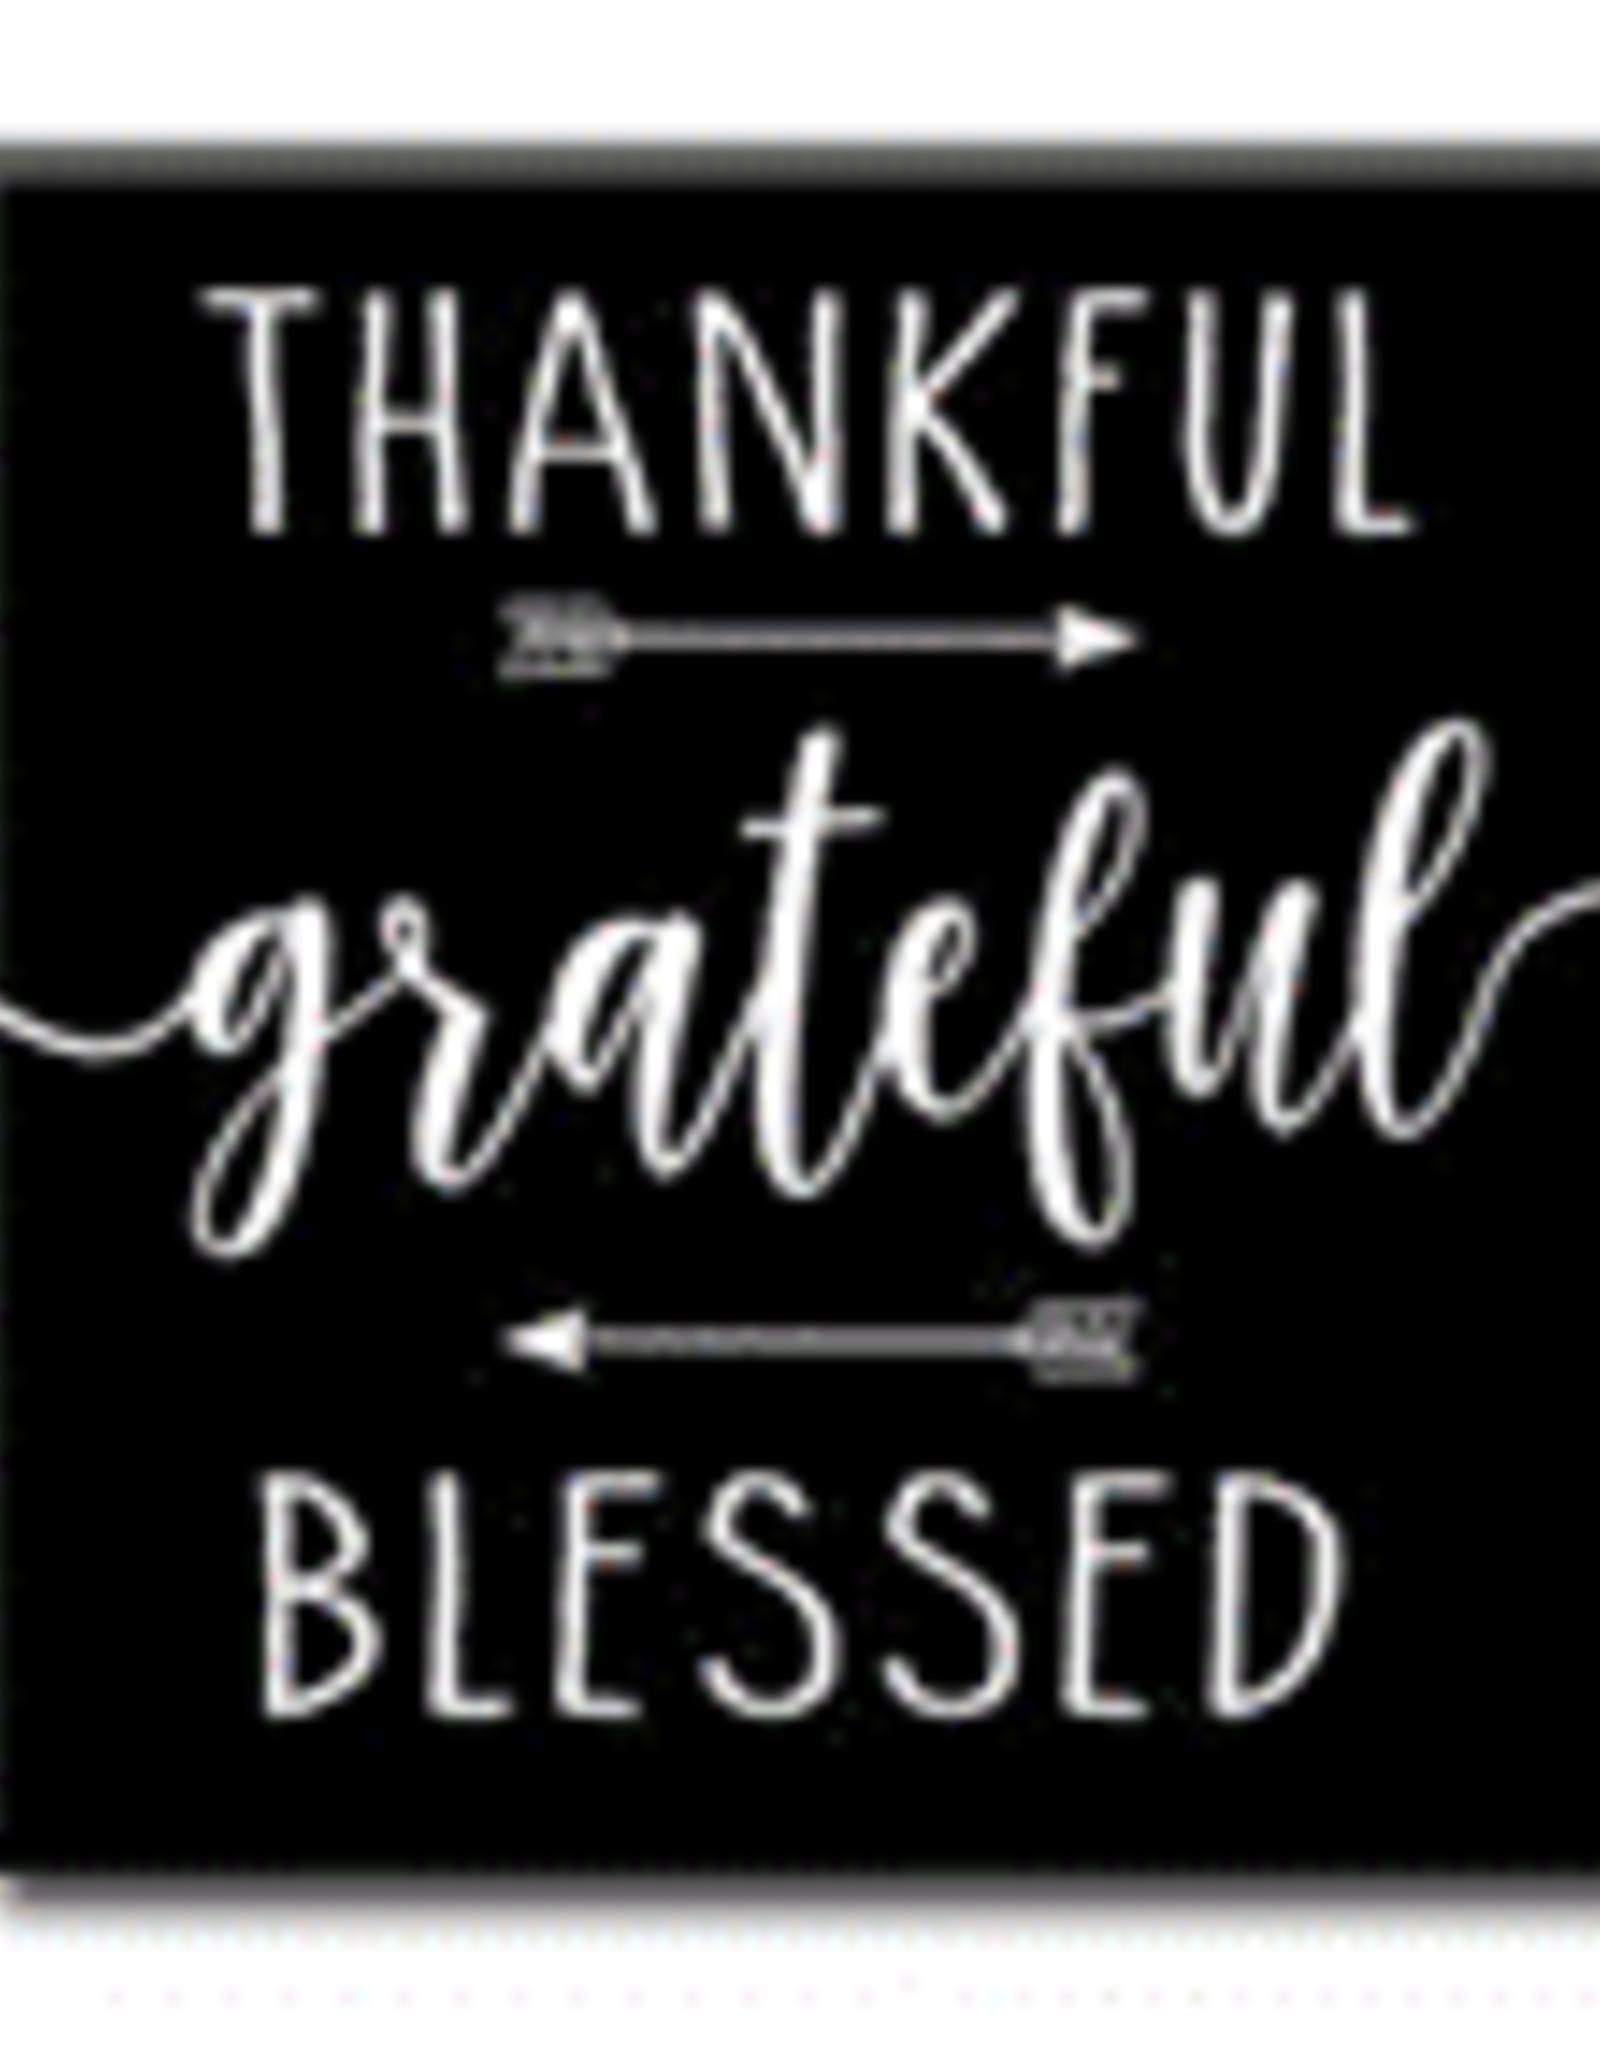 Thankful Grateful Blessed 4x4